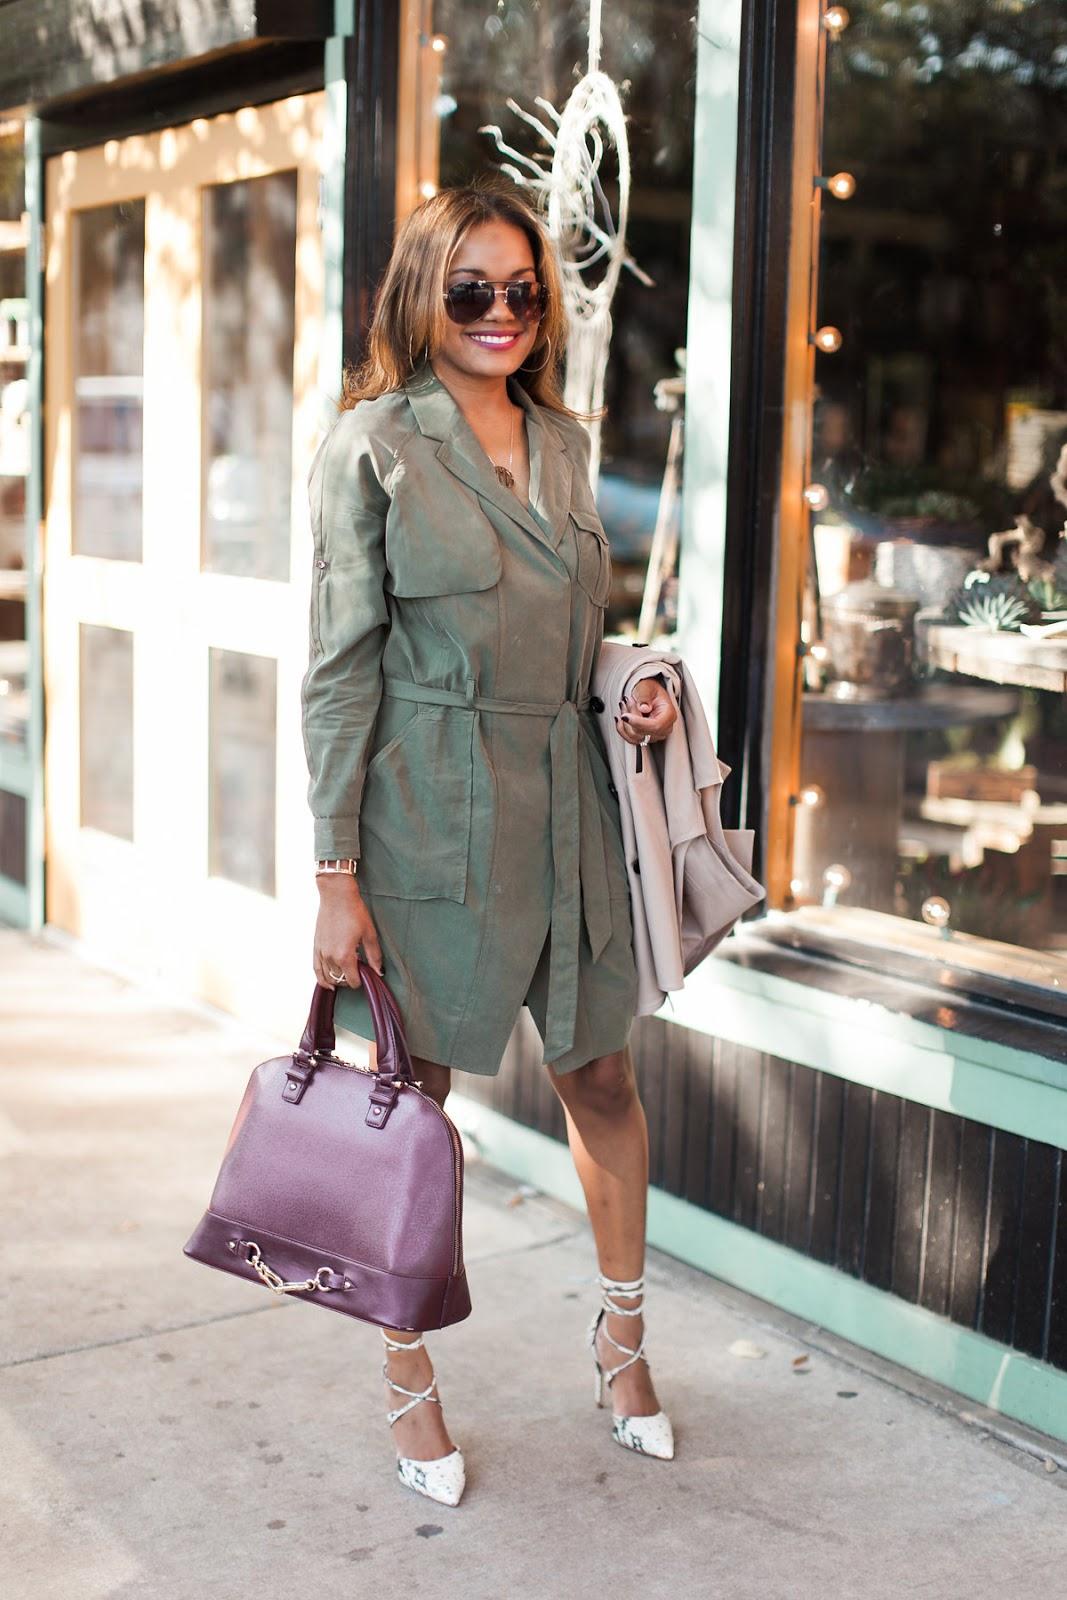 Banana Republic olive trench dress, olive, fall fashion, how to layer, ann taylor, trench dress, steve madden raela pump, justfab, dallas fashion blogger, fashion blogger, detroit fashion blogger, black fashion blogger, steve madden